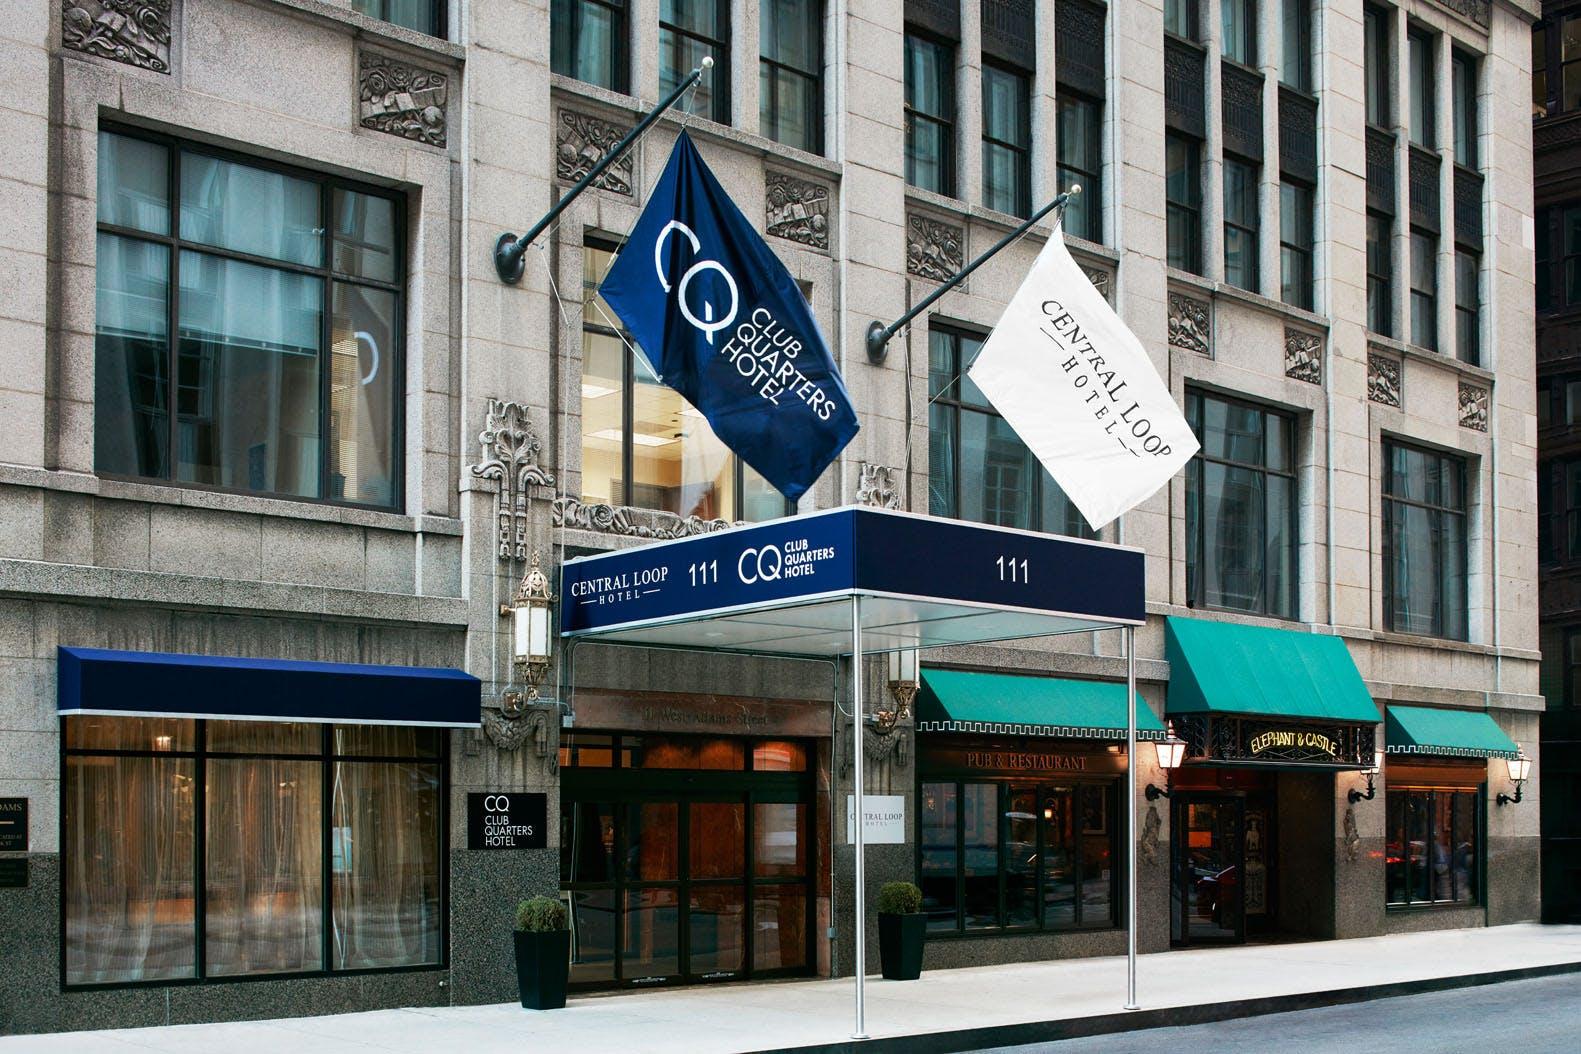 Central Loop Club Quarters Hotels